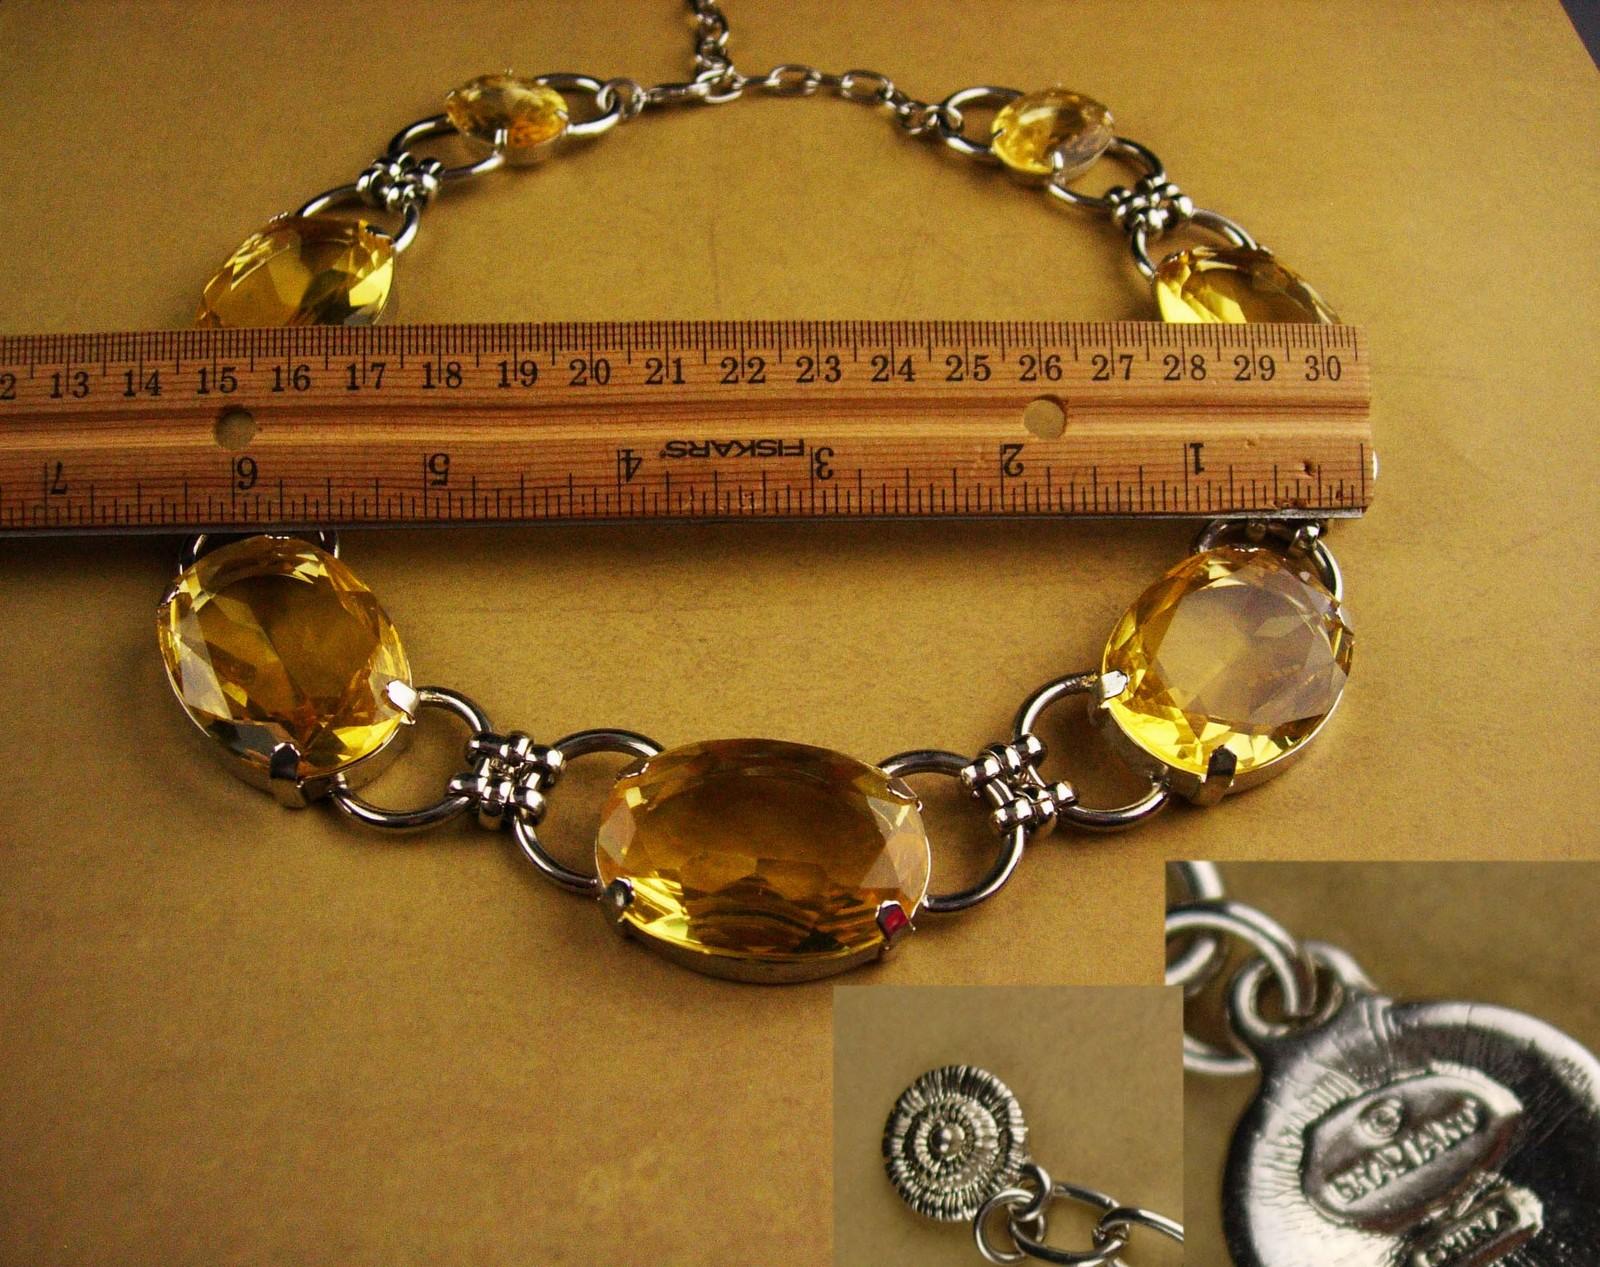 HUGE Graziano necklace - BIG yellow rhinestone choker - statement necklace - cou